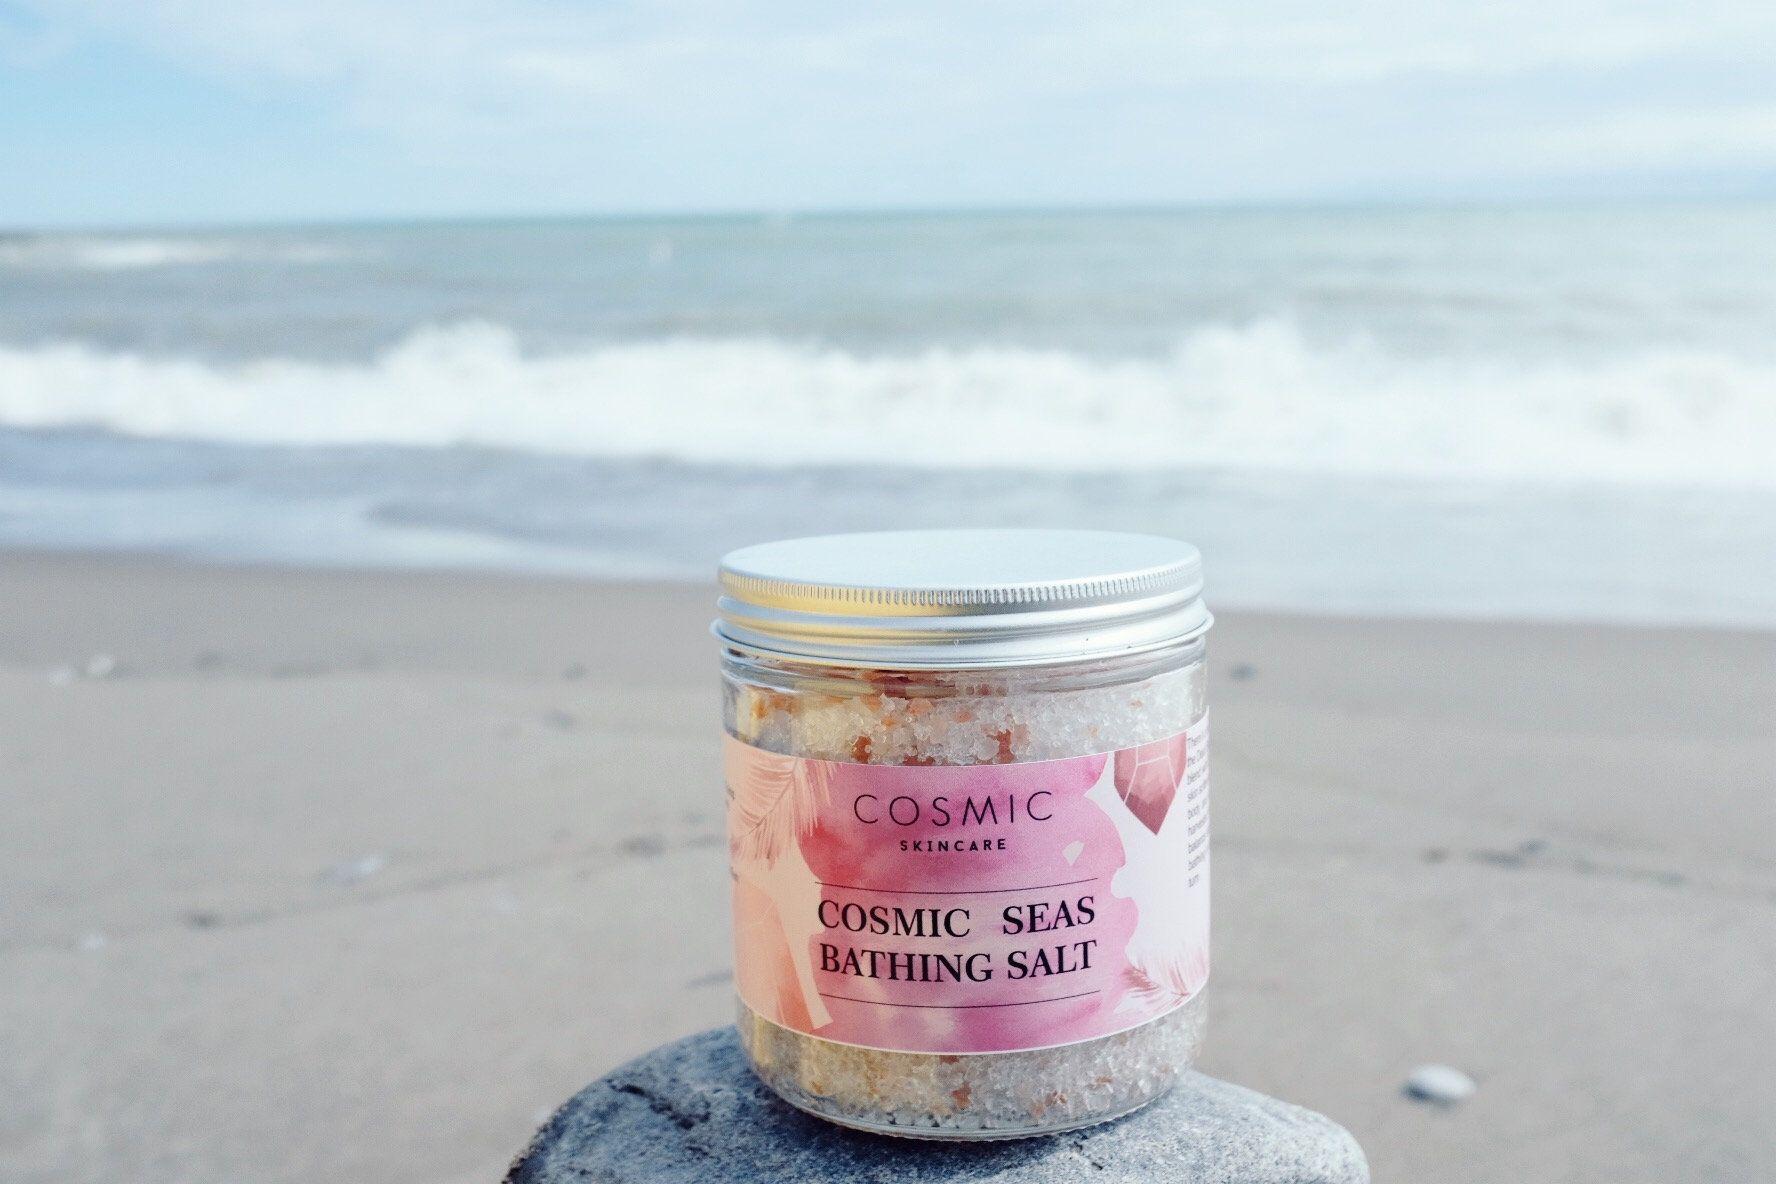 Cosmic bath saltsnatural skincarevegan beautyepsom